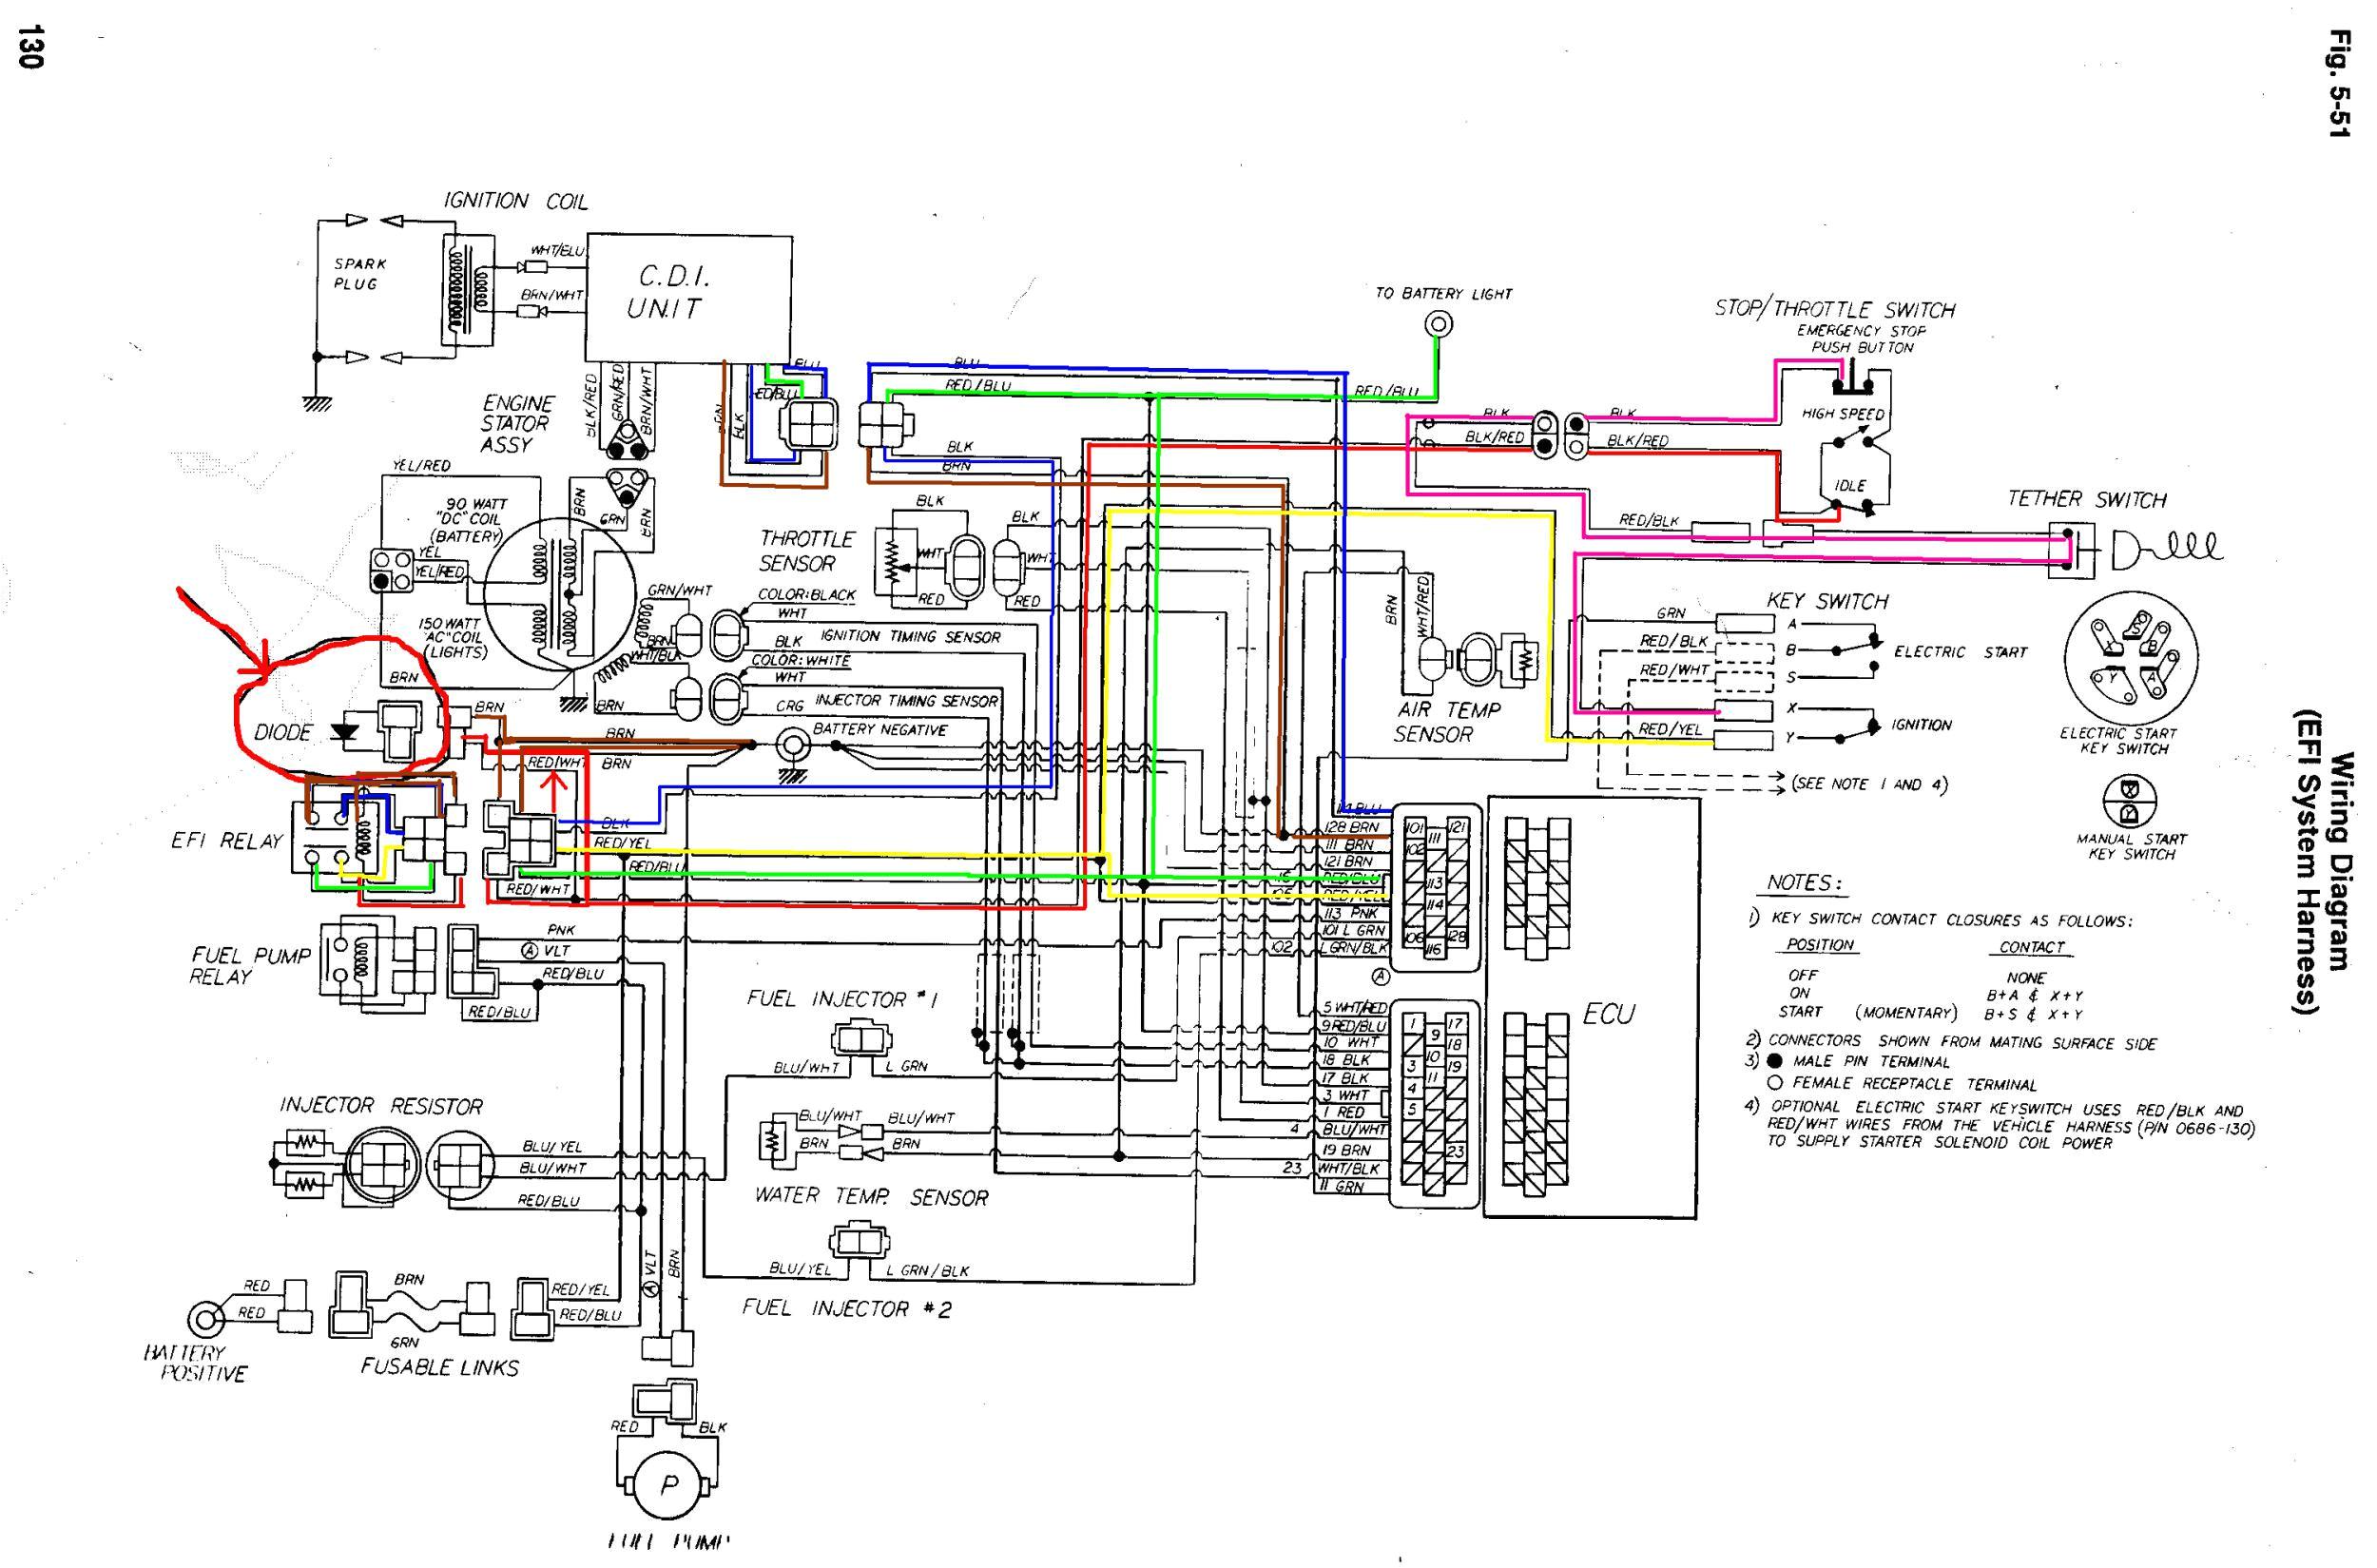 1989 arctic cat cougar 500 wiring diagrams wiring diagrams bib 1989 arctic cat cougar 500 wiring diagrams